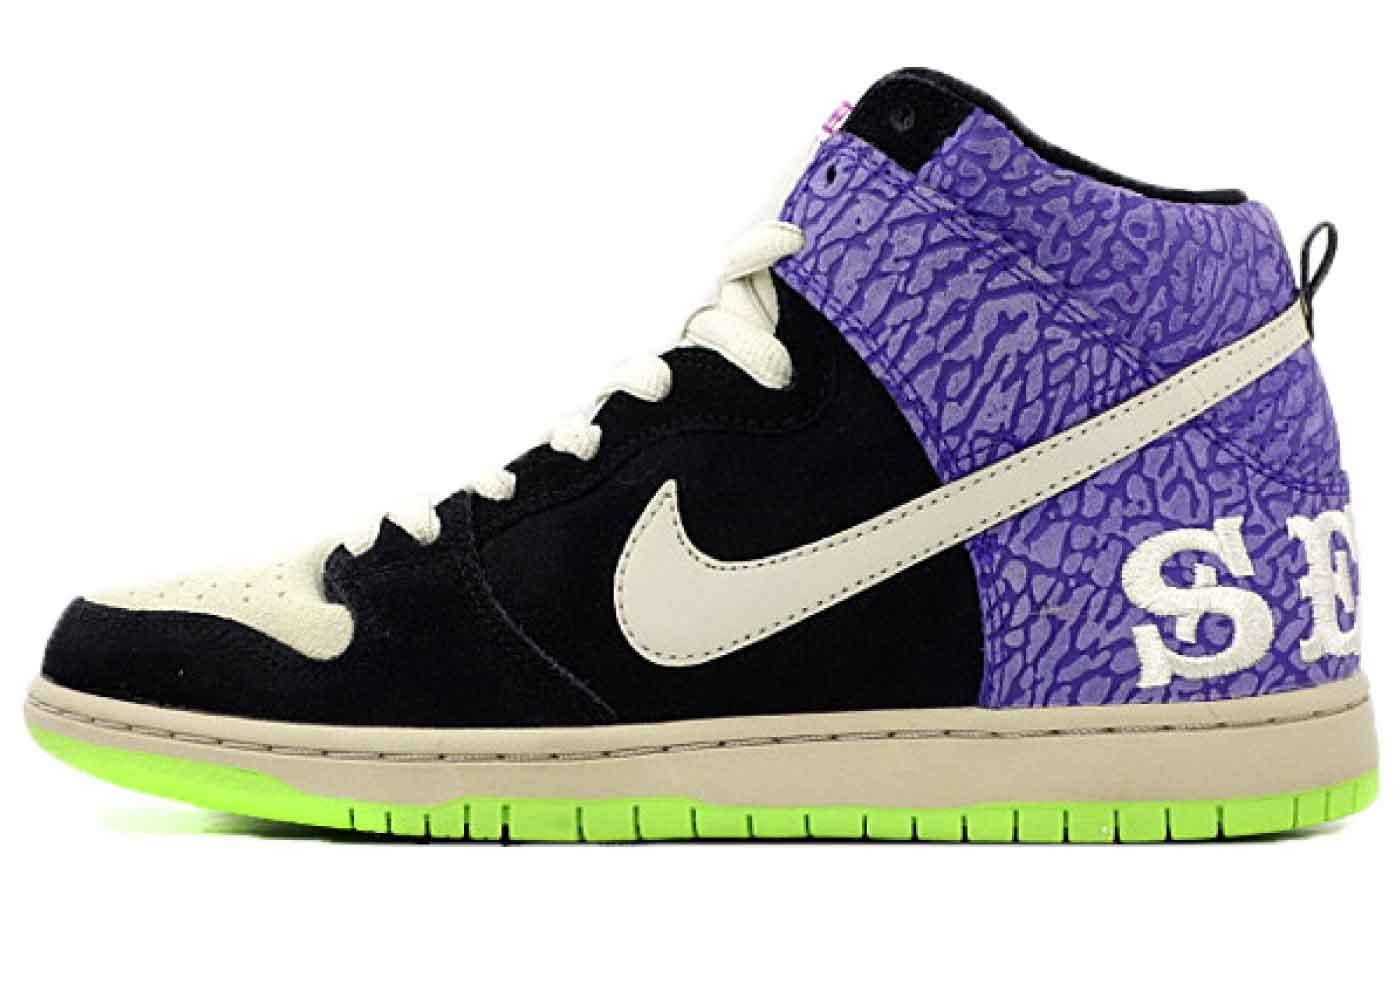 Nike Dunk High Send Help 2の写真